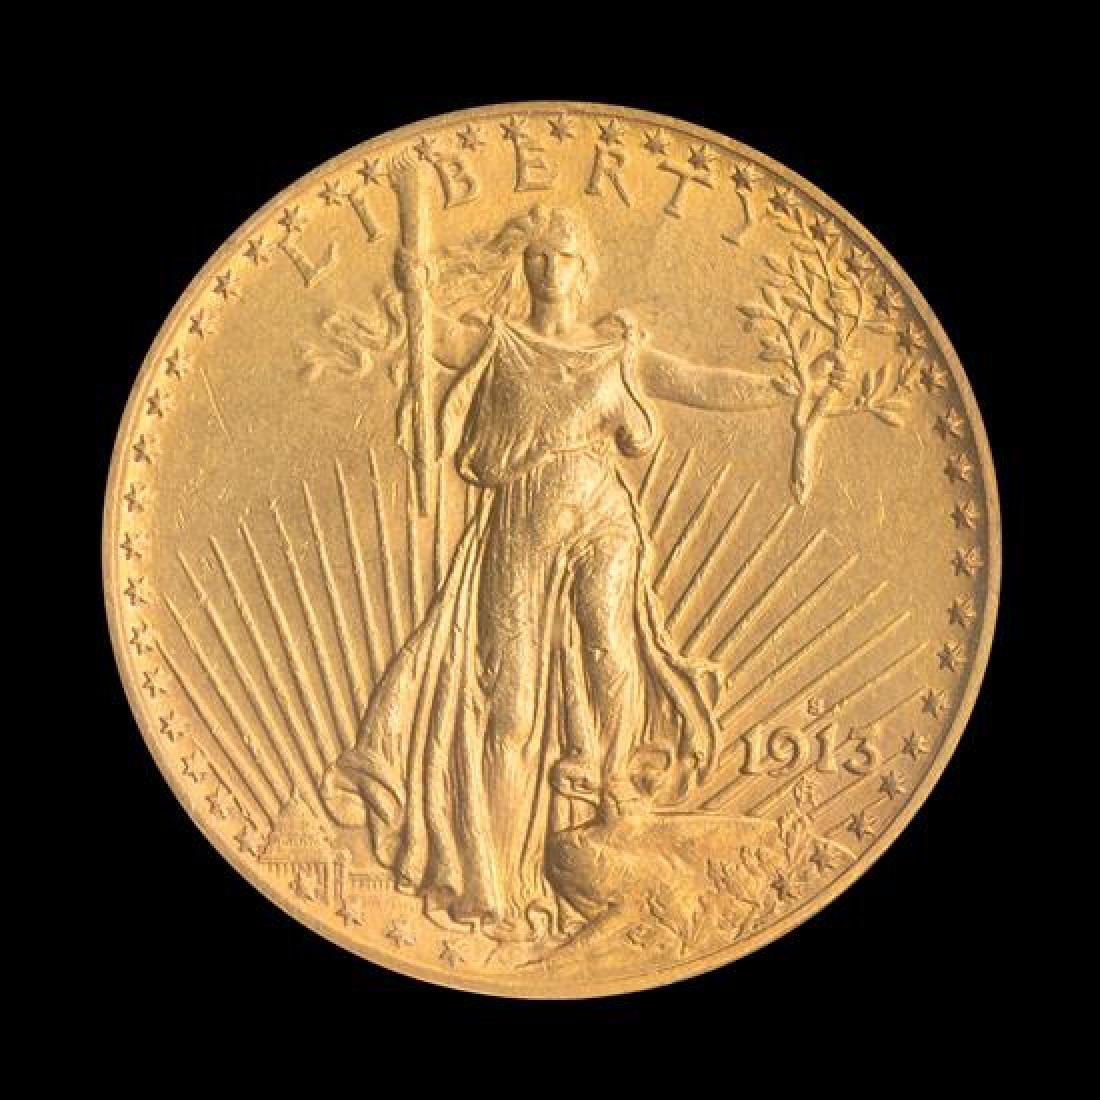 A United States 1913-S Saint-Gaudens $20 Gold Coin